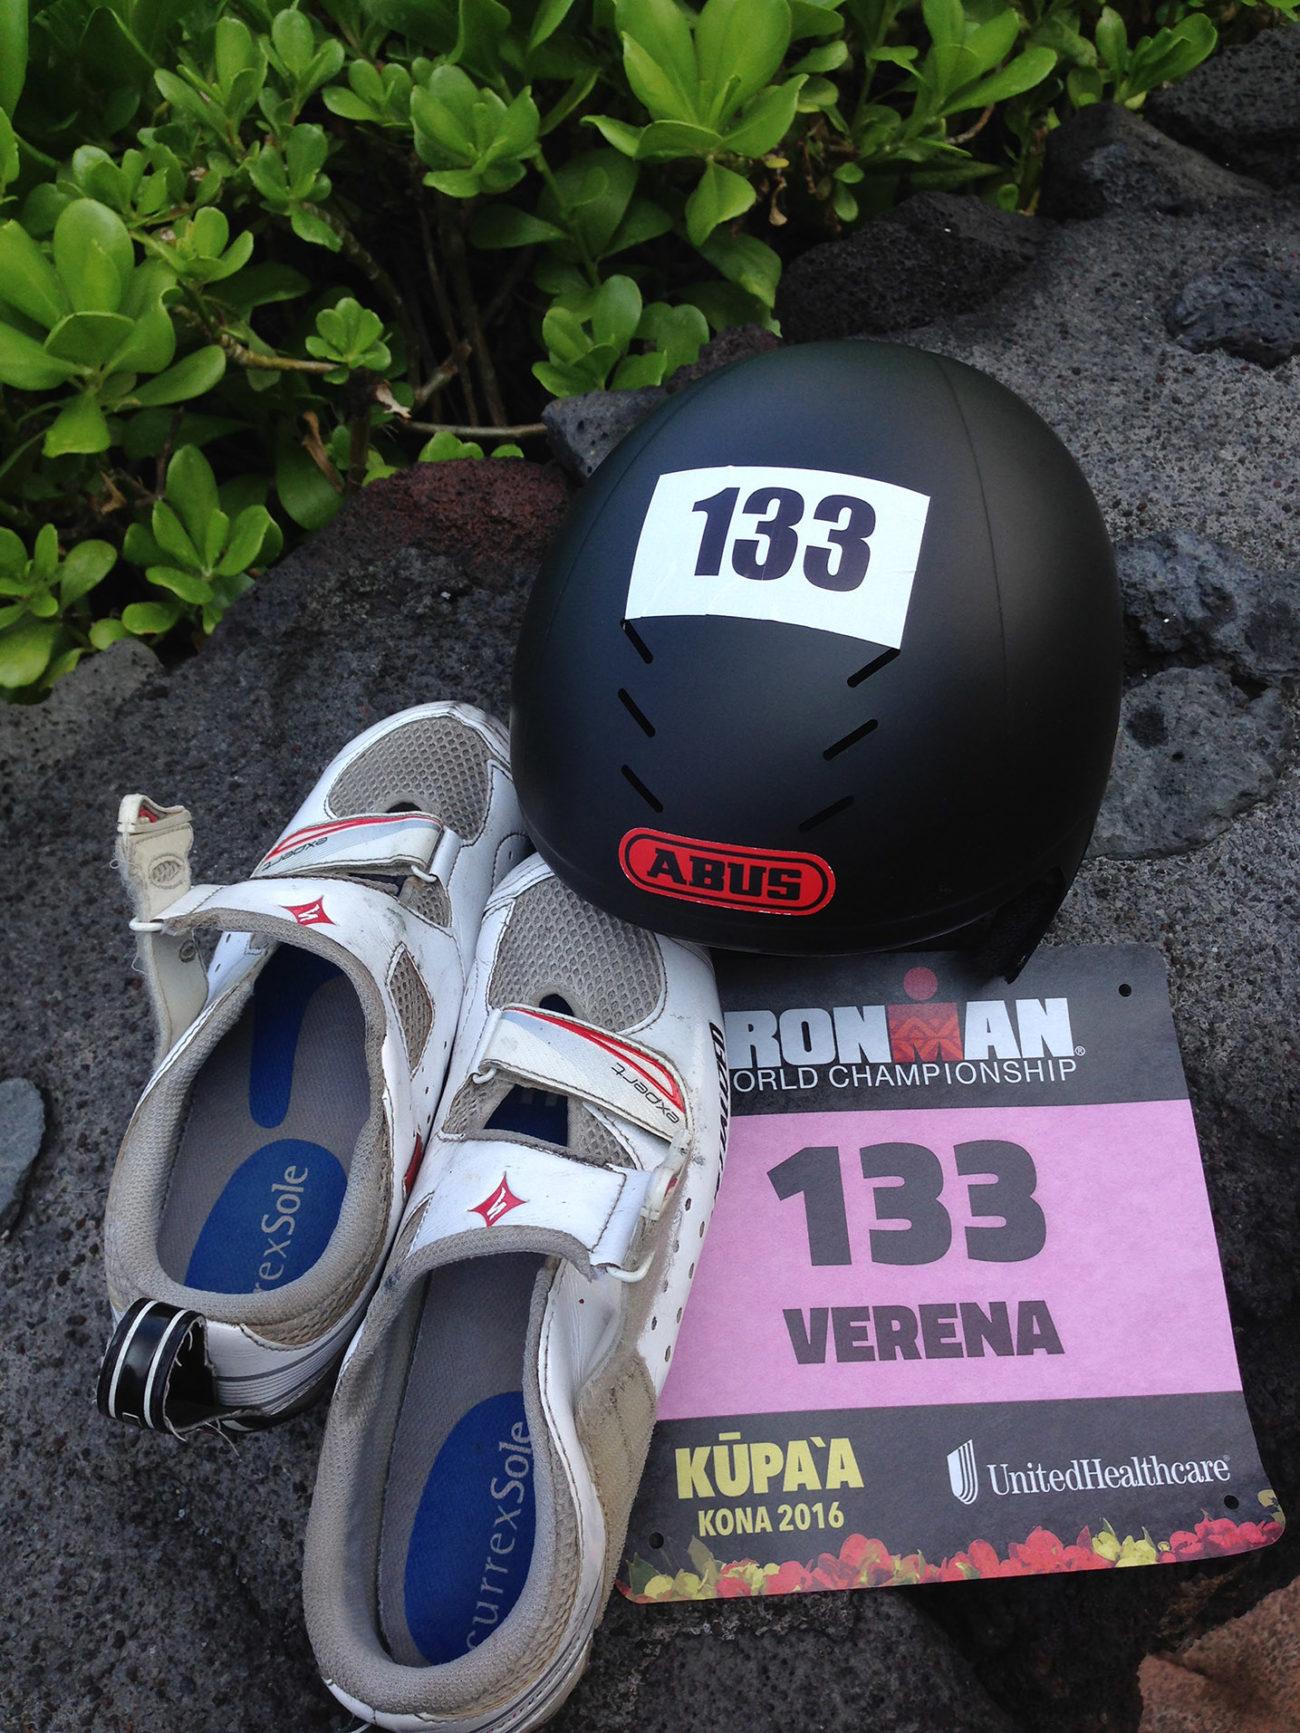 IRONMAN Hawaii 2016 – Startnummer 133